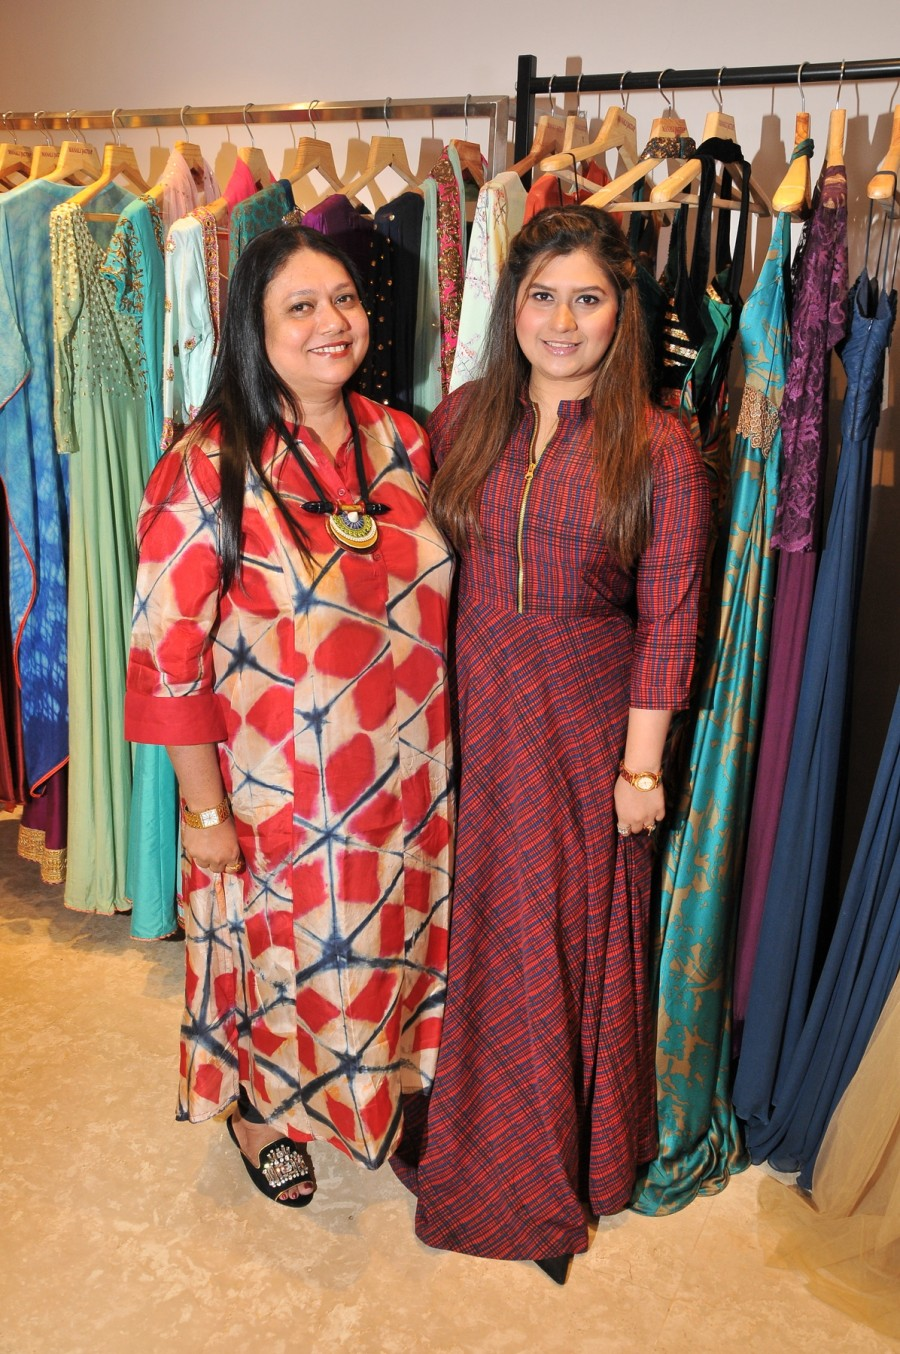 The Big Brand Show,Sumita Mukherjee at The Big Brand Show,Manali Jagtap at The Big Brand Show,Sumita Mukherjee,Manali Jagtap,Shweta Khanduri,Shagun Gupta,Smita Gondkar